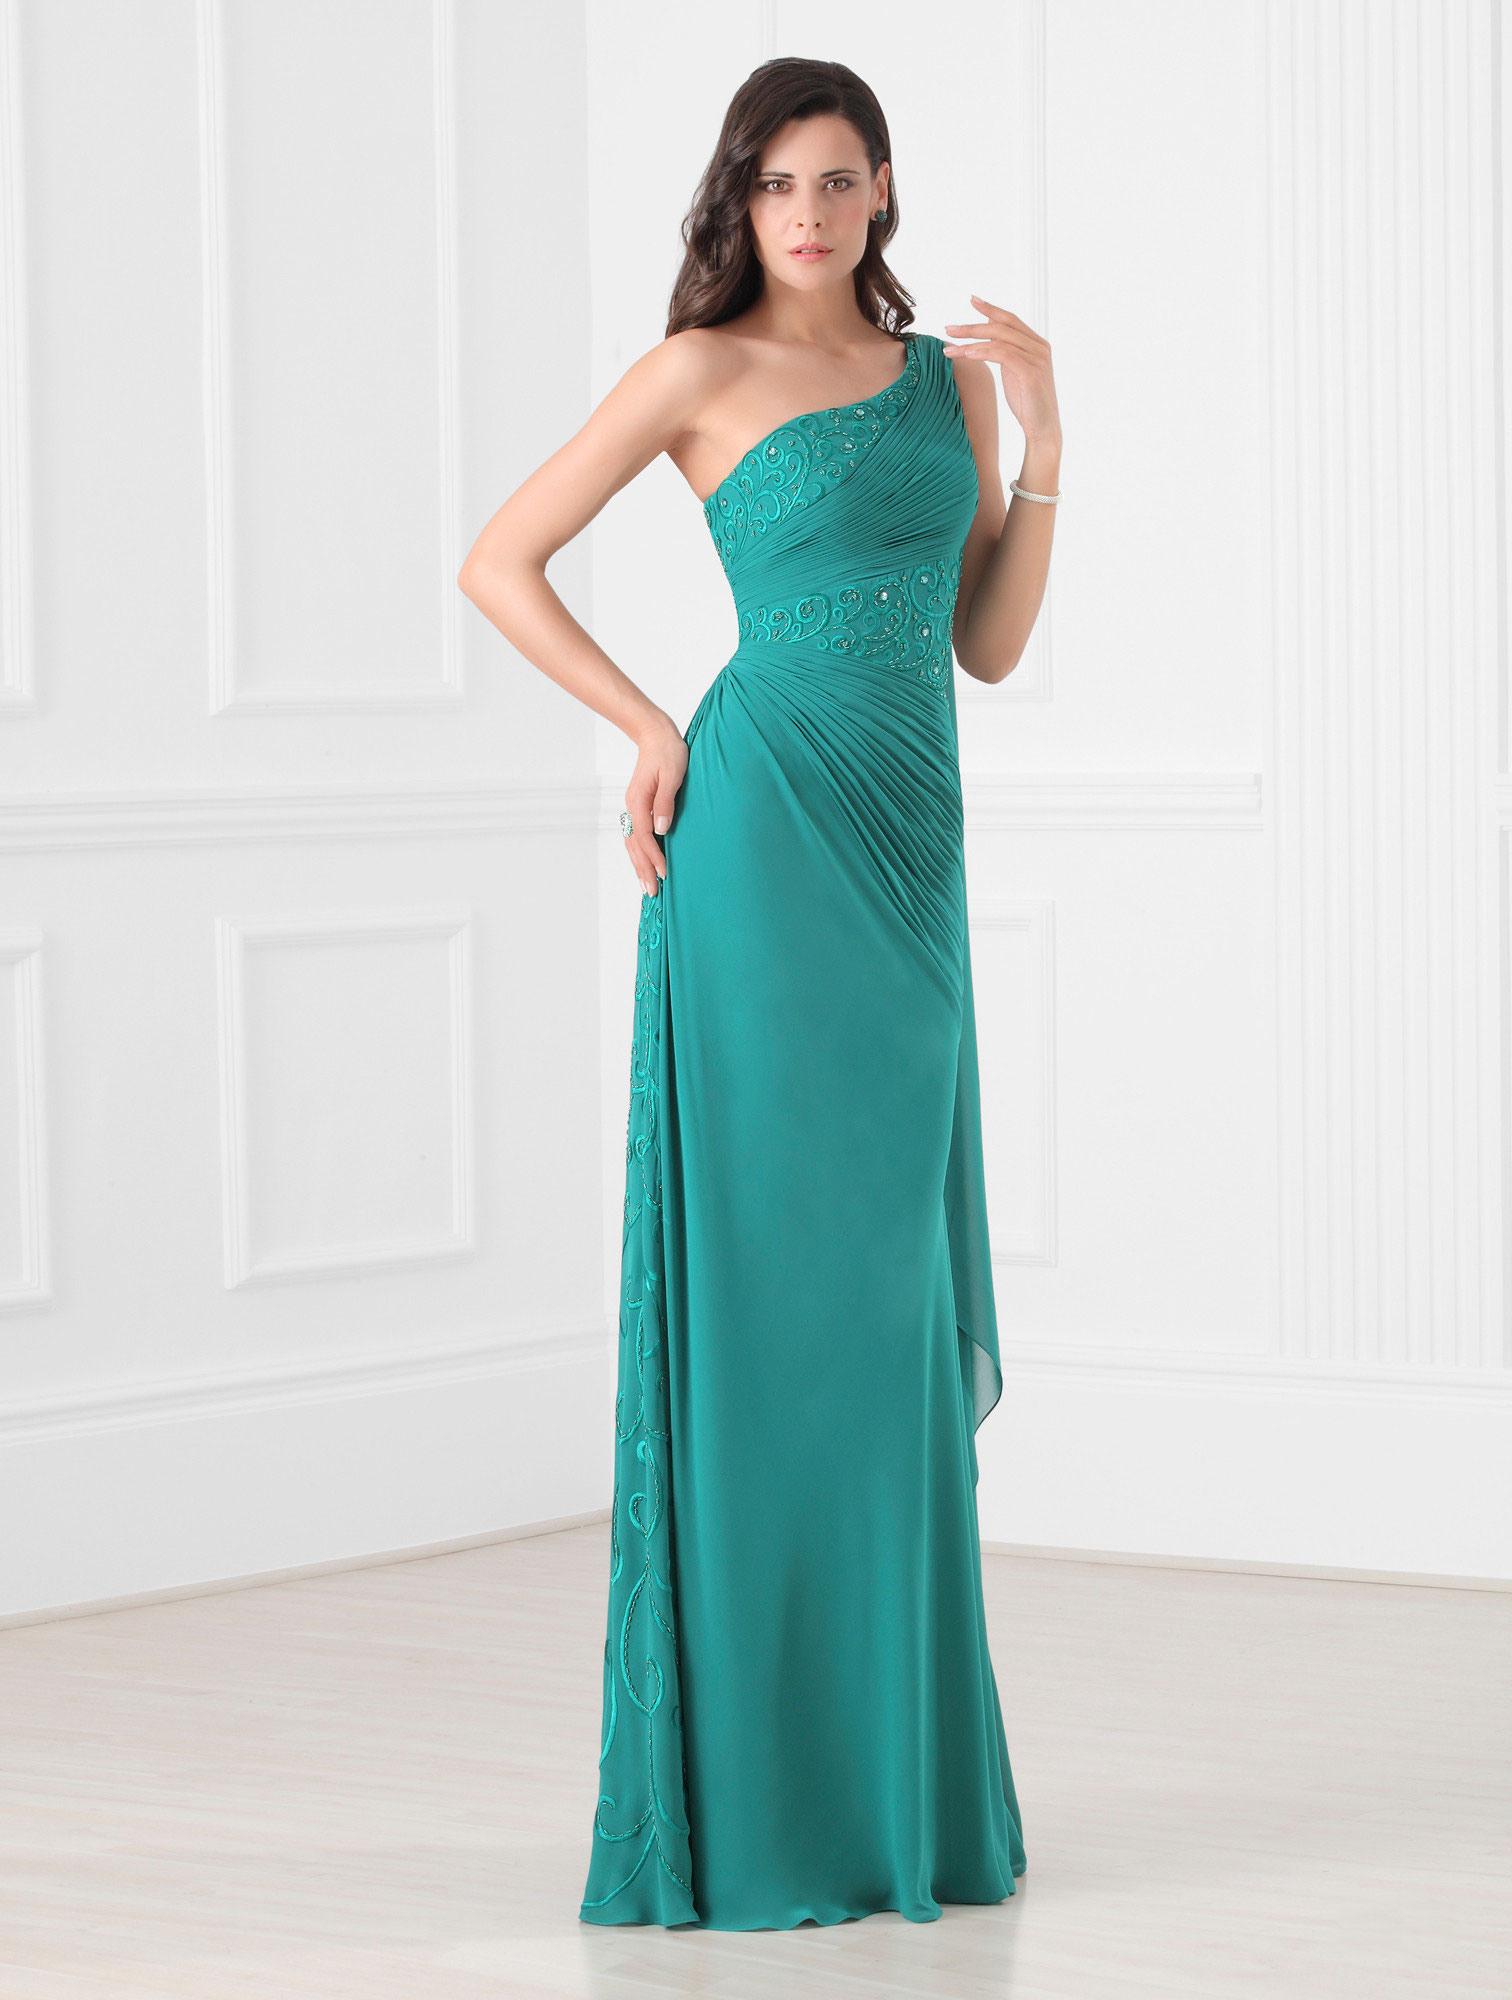 20 Wunderbar Abendkleider Basel Boutique10 Elegant Abendkleider Basel für 2019